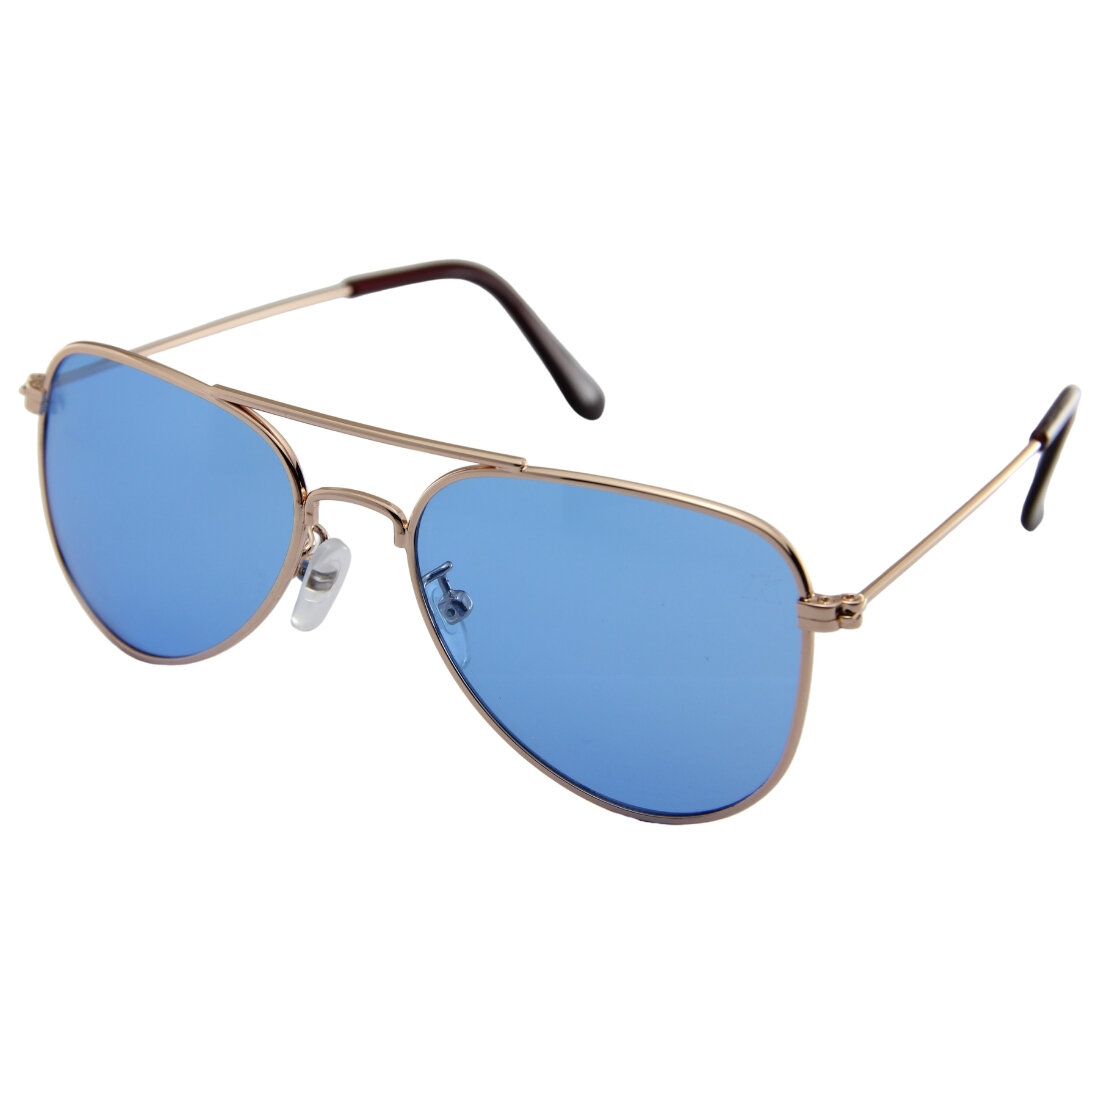 OUTLET - Óculos de Sol Khatto Kids Aviador Station